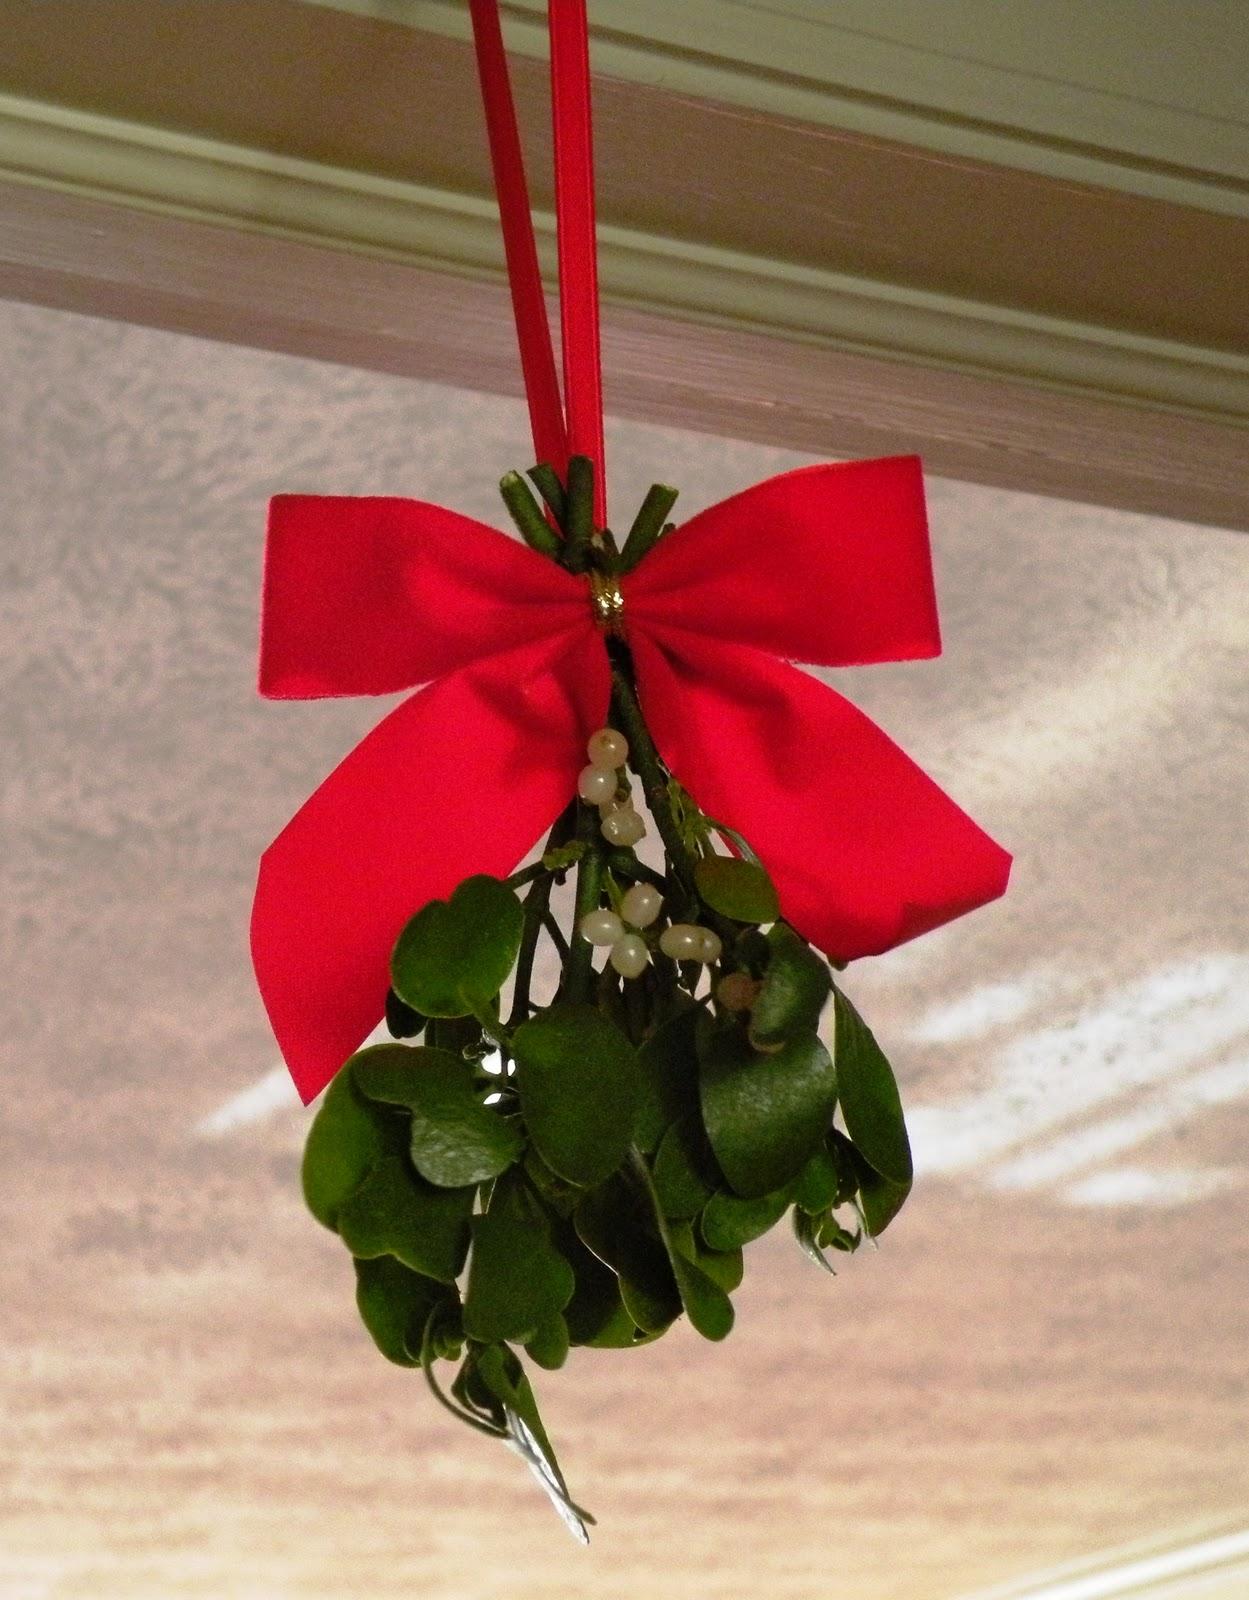 Appalachian Living: The Search for Mistletoe